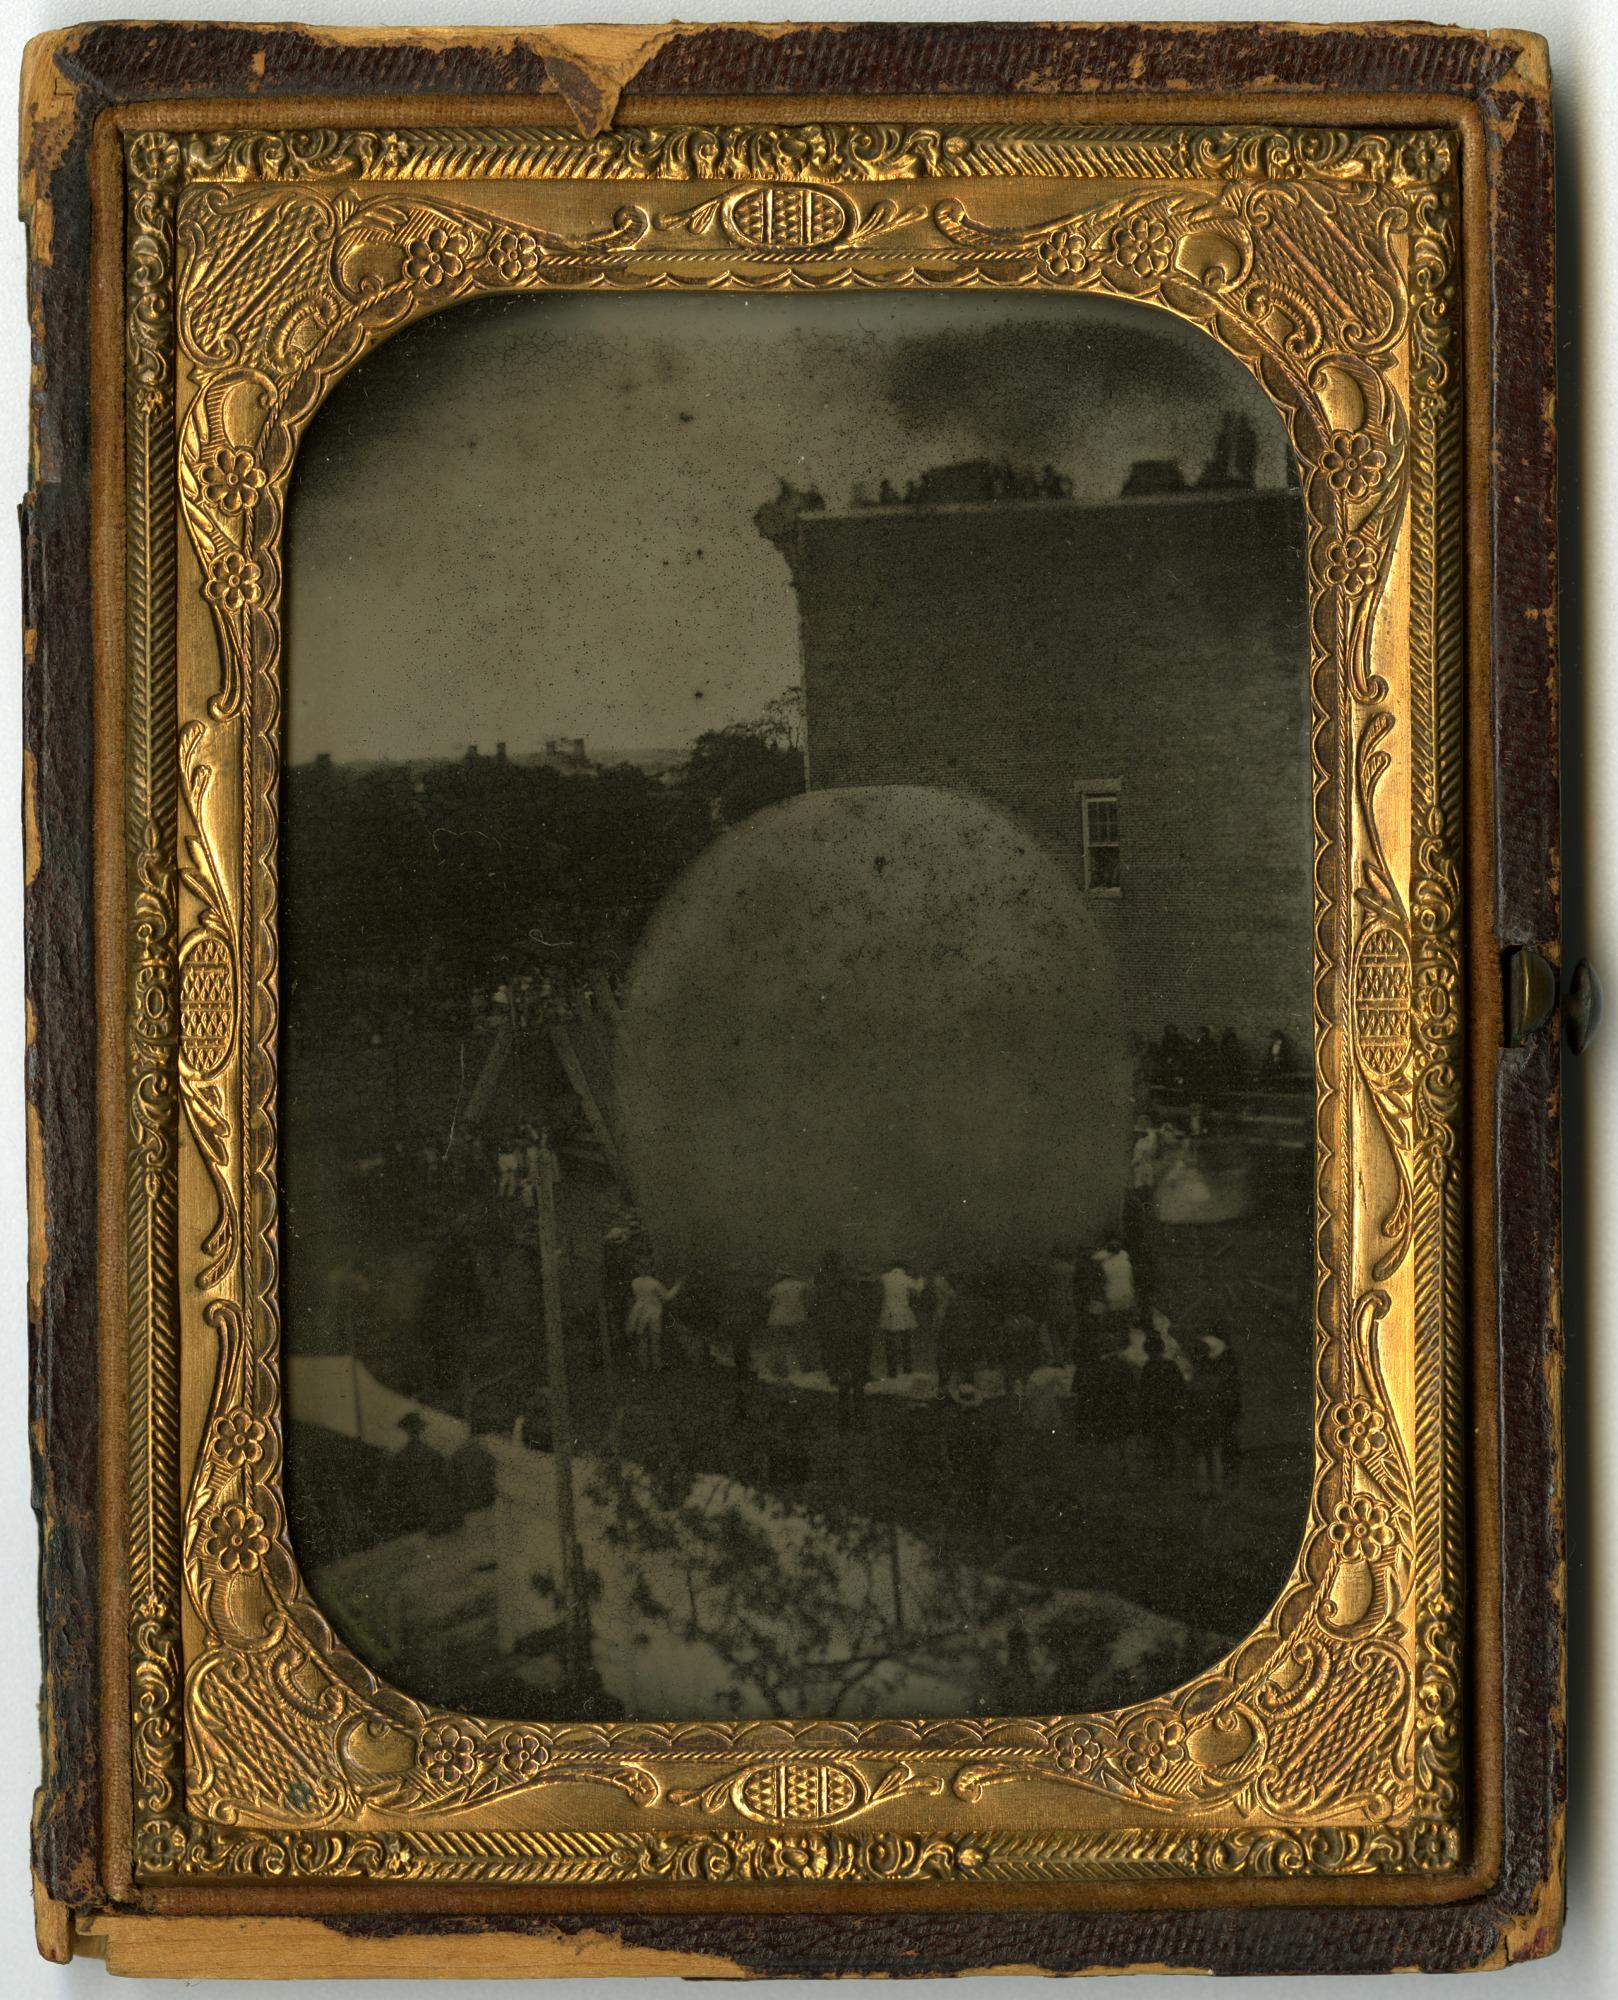 images for LTA, Balloons, USA, Steiner (John), Erie, Pennsylvania, Ascension (June 1857). photograph